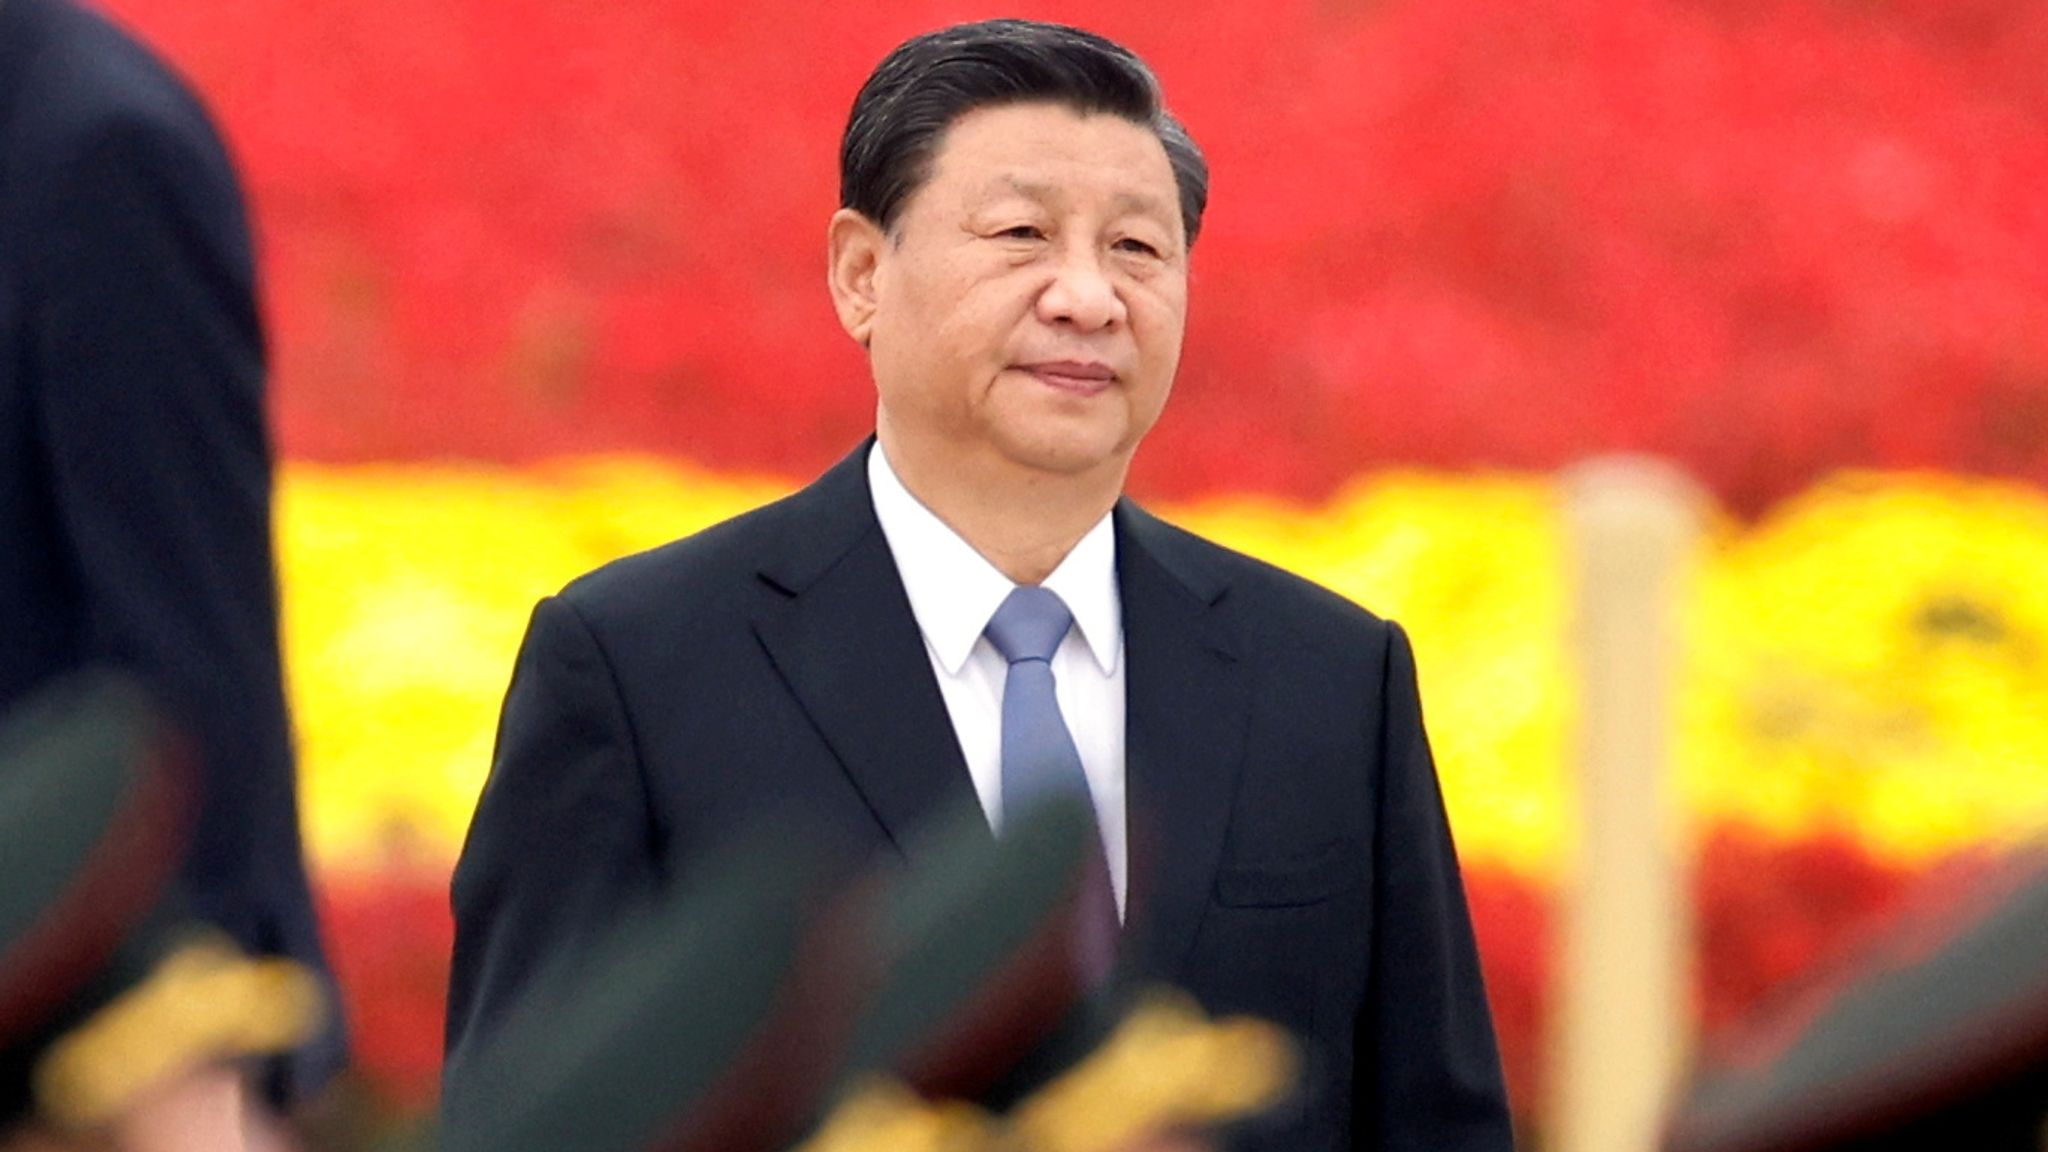 Chinese President, Japanese Prime Minister Discuss Strengthening Regional Cooperation